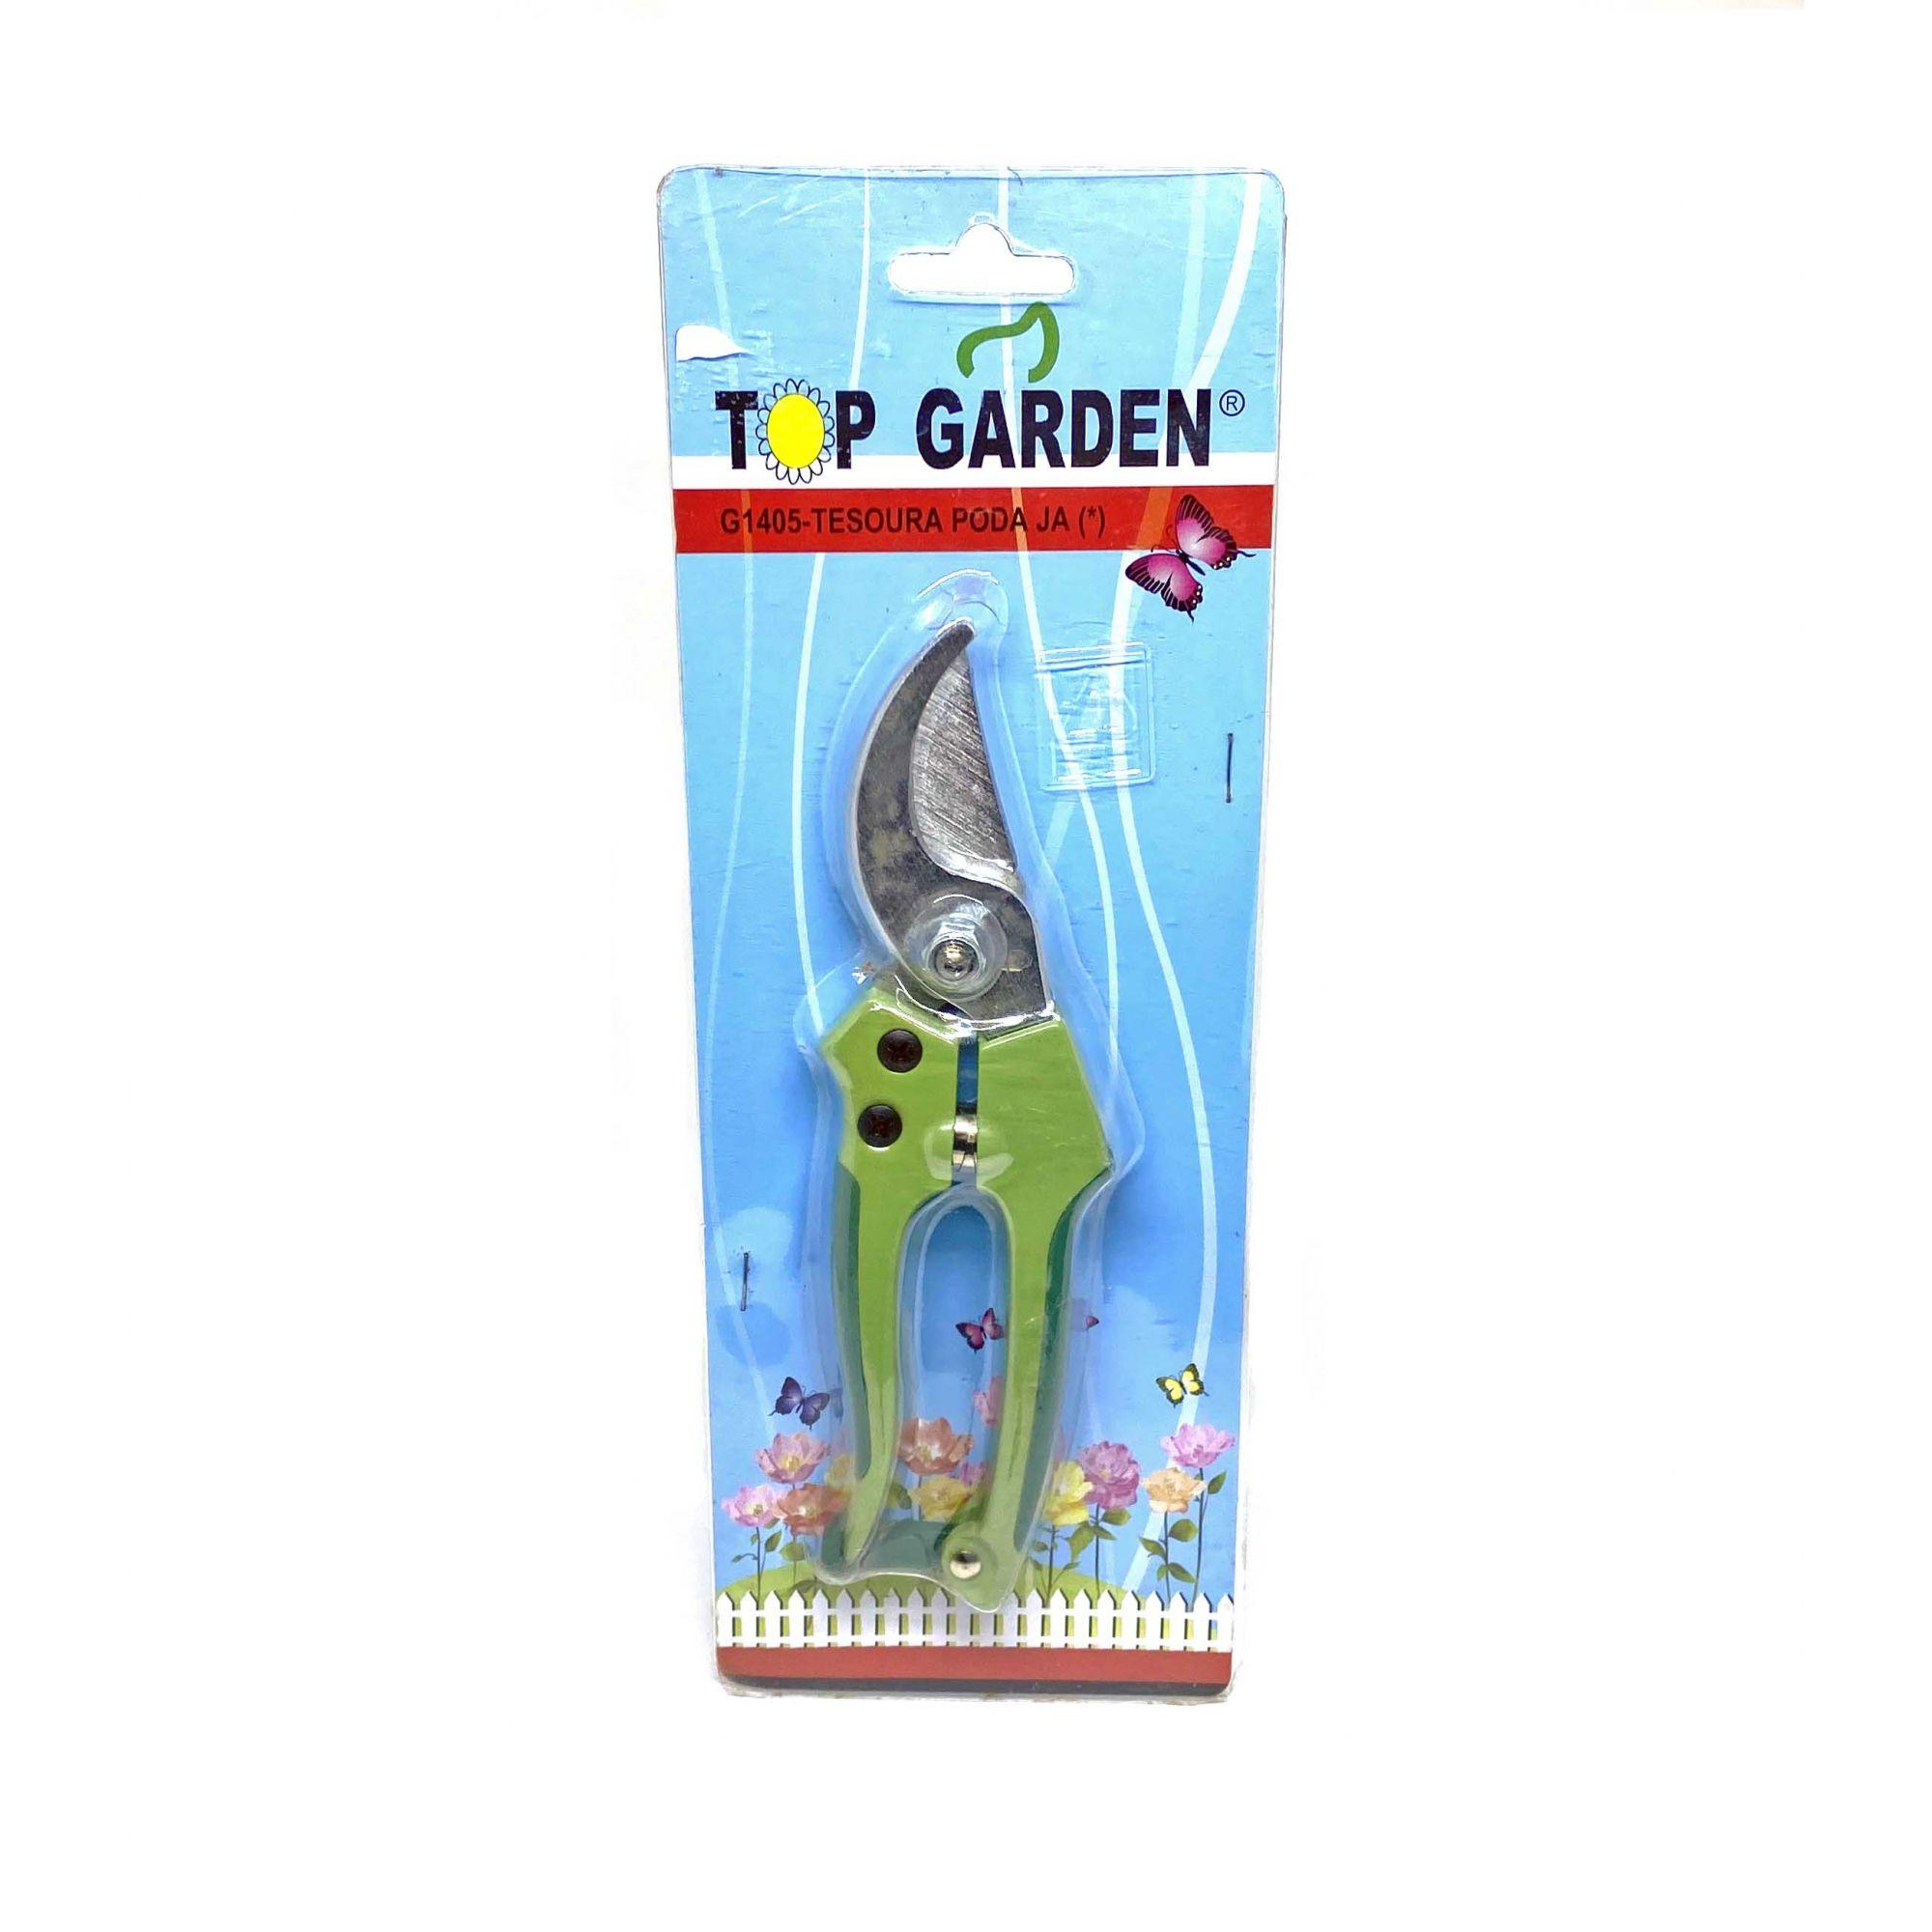 Tesoura  Japonesa Steel G1405 Top Garden